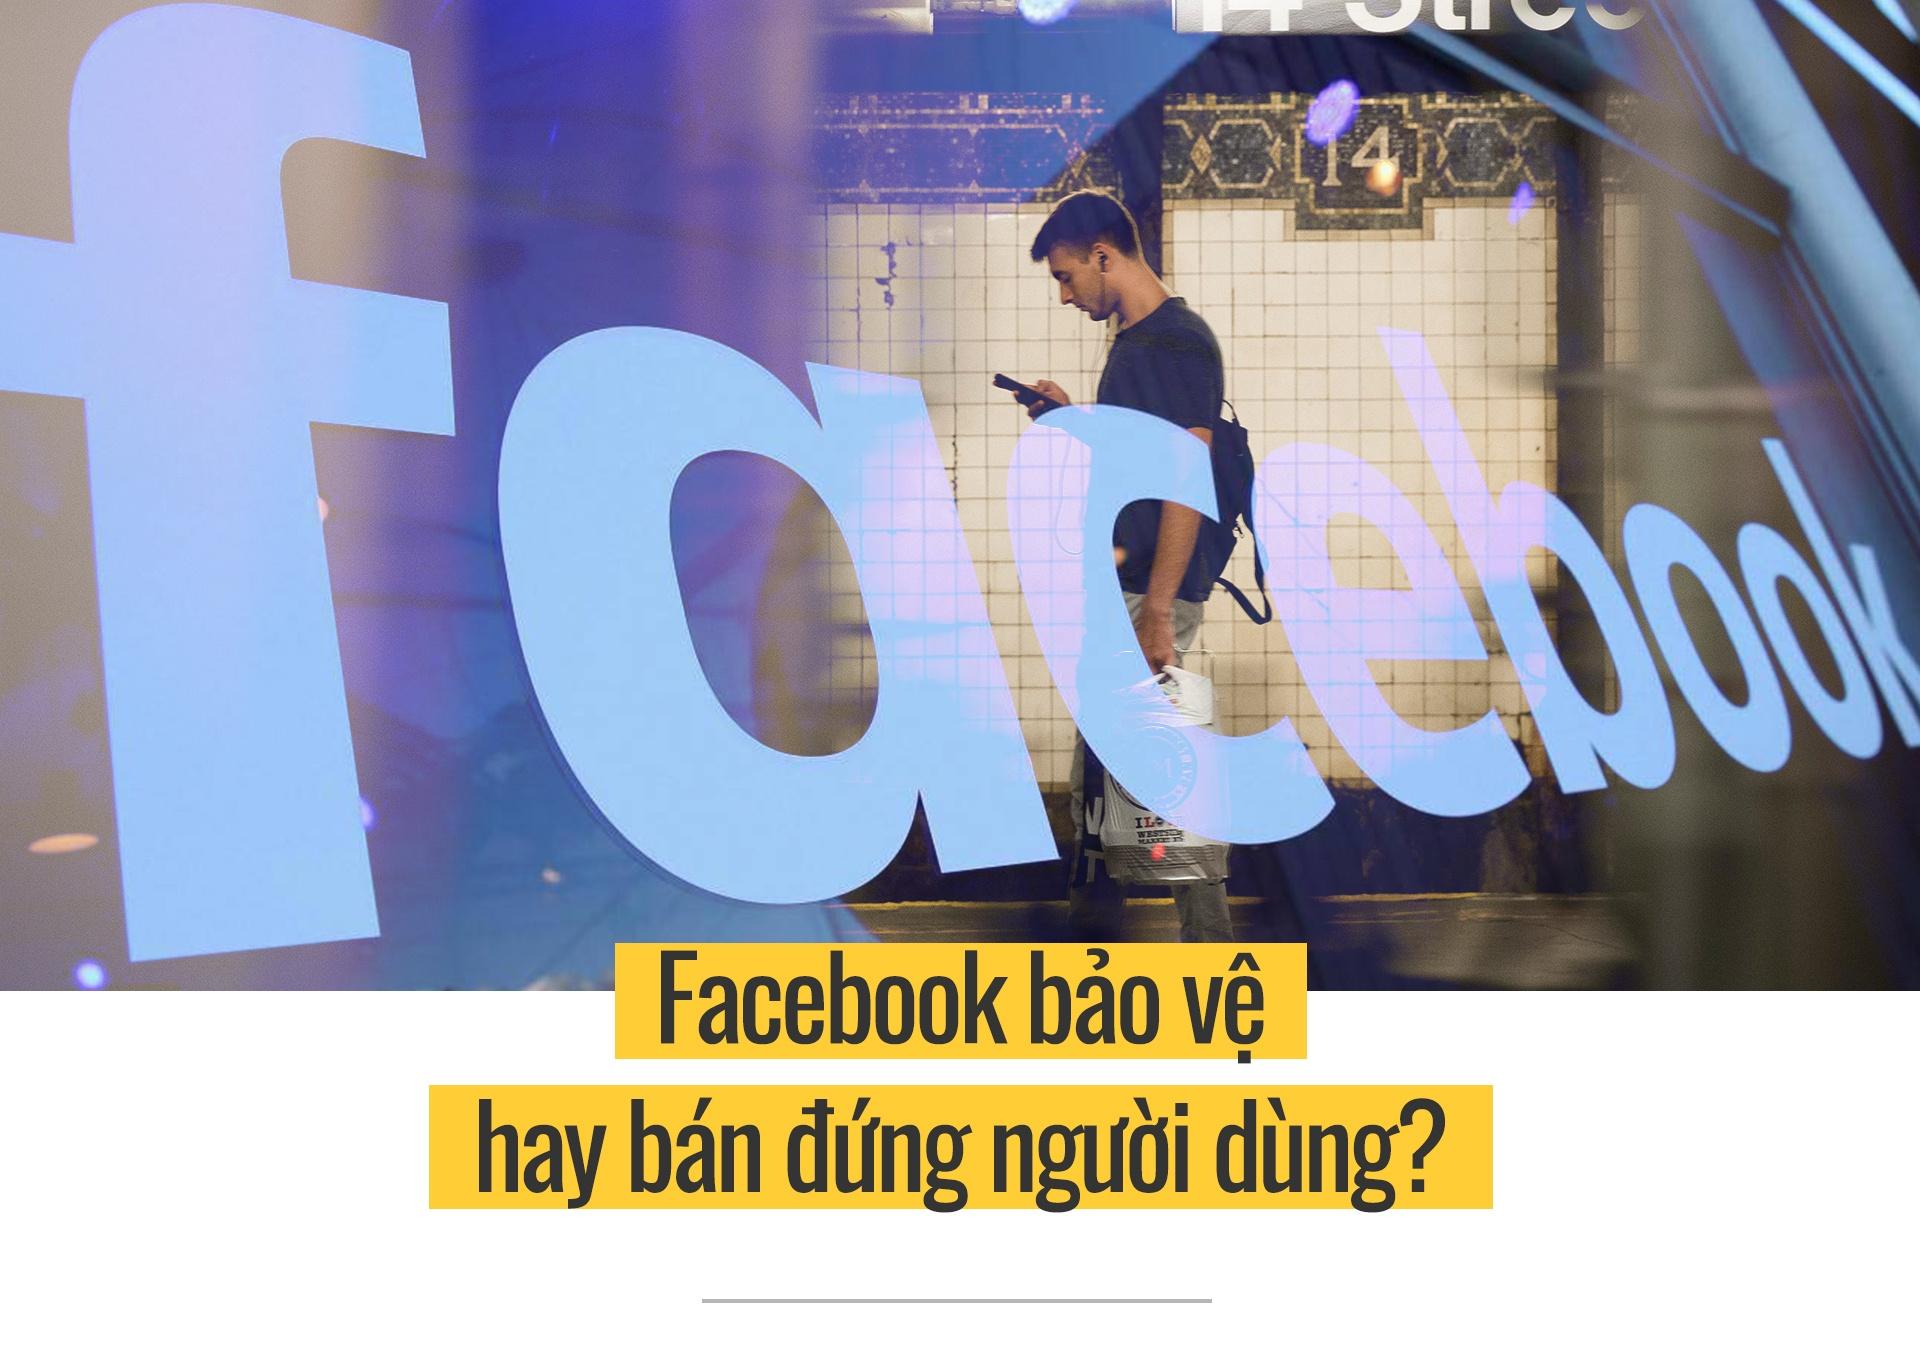 Facebook bao ve hay ban dung nguoi dung? hinh anh 2